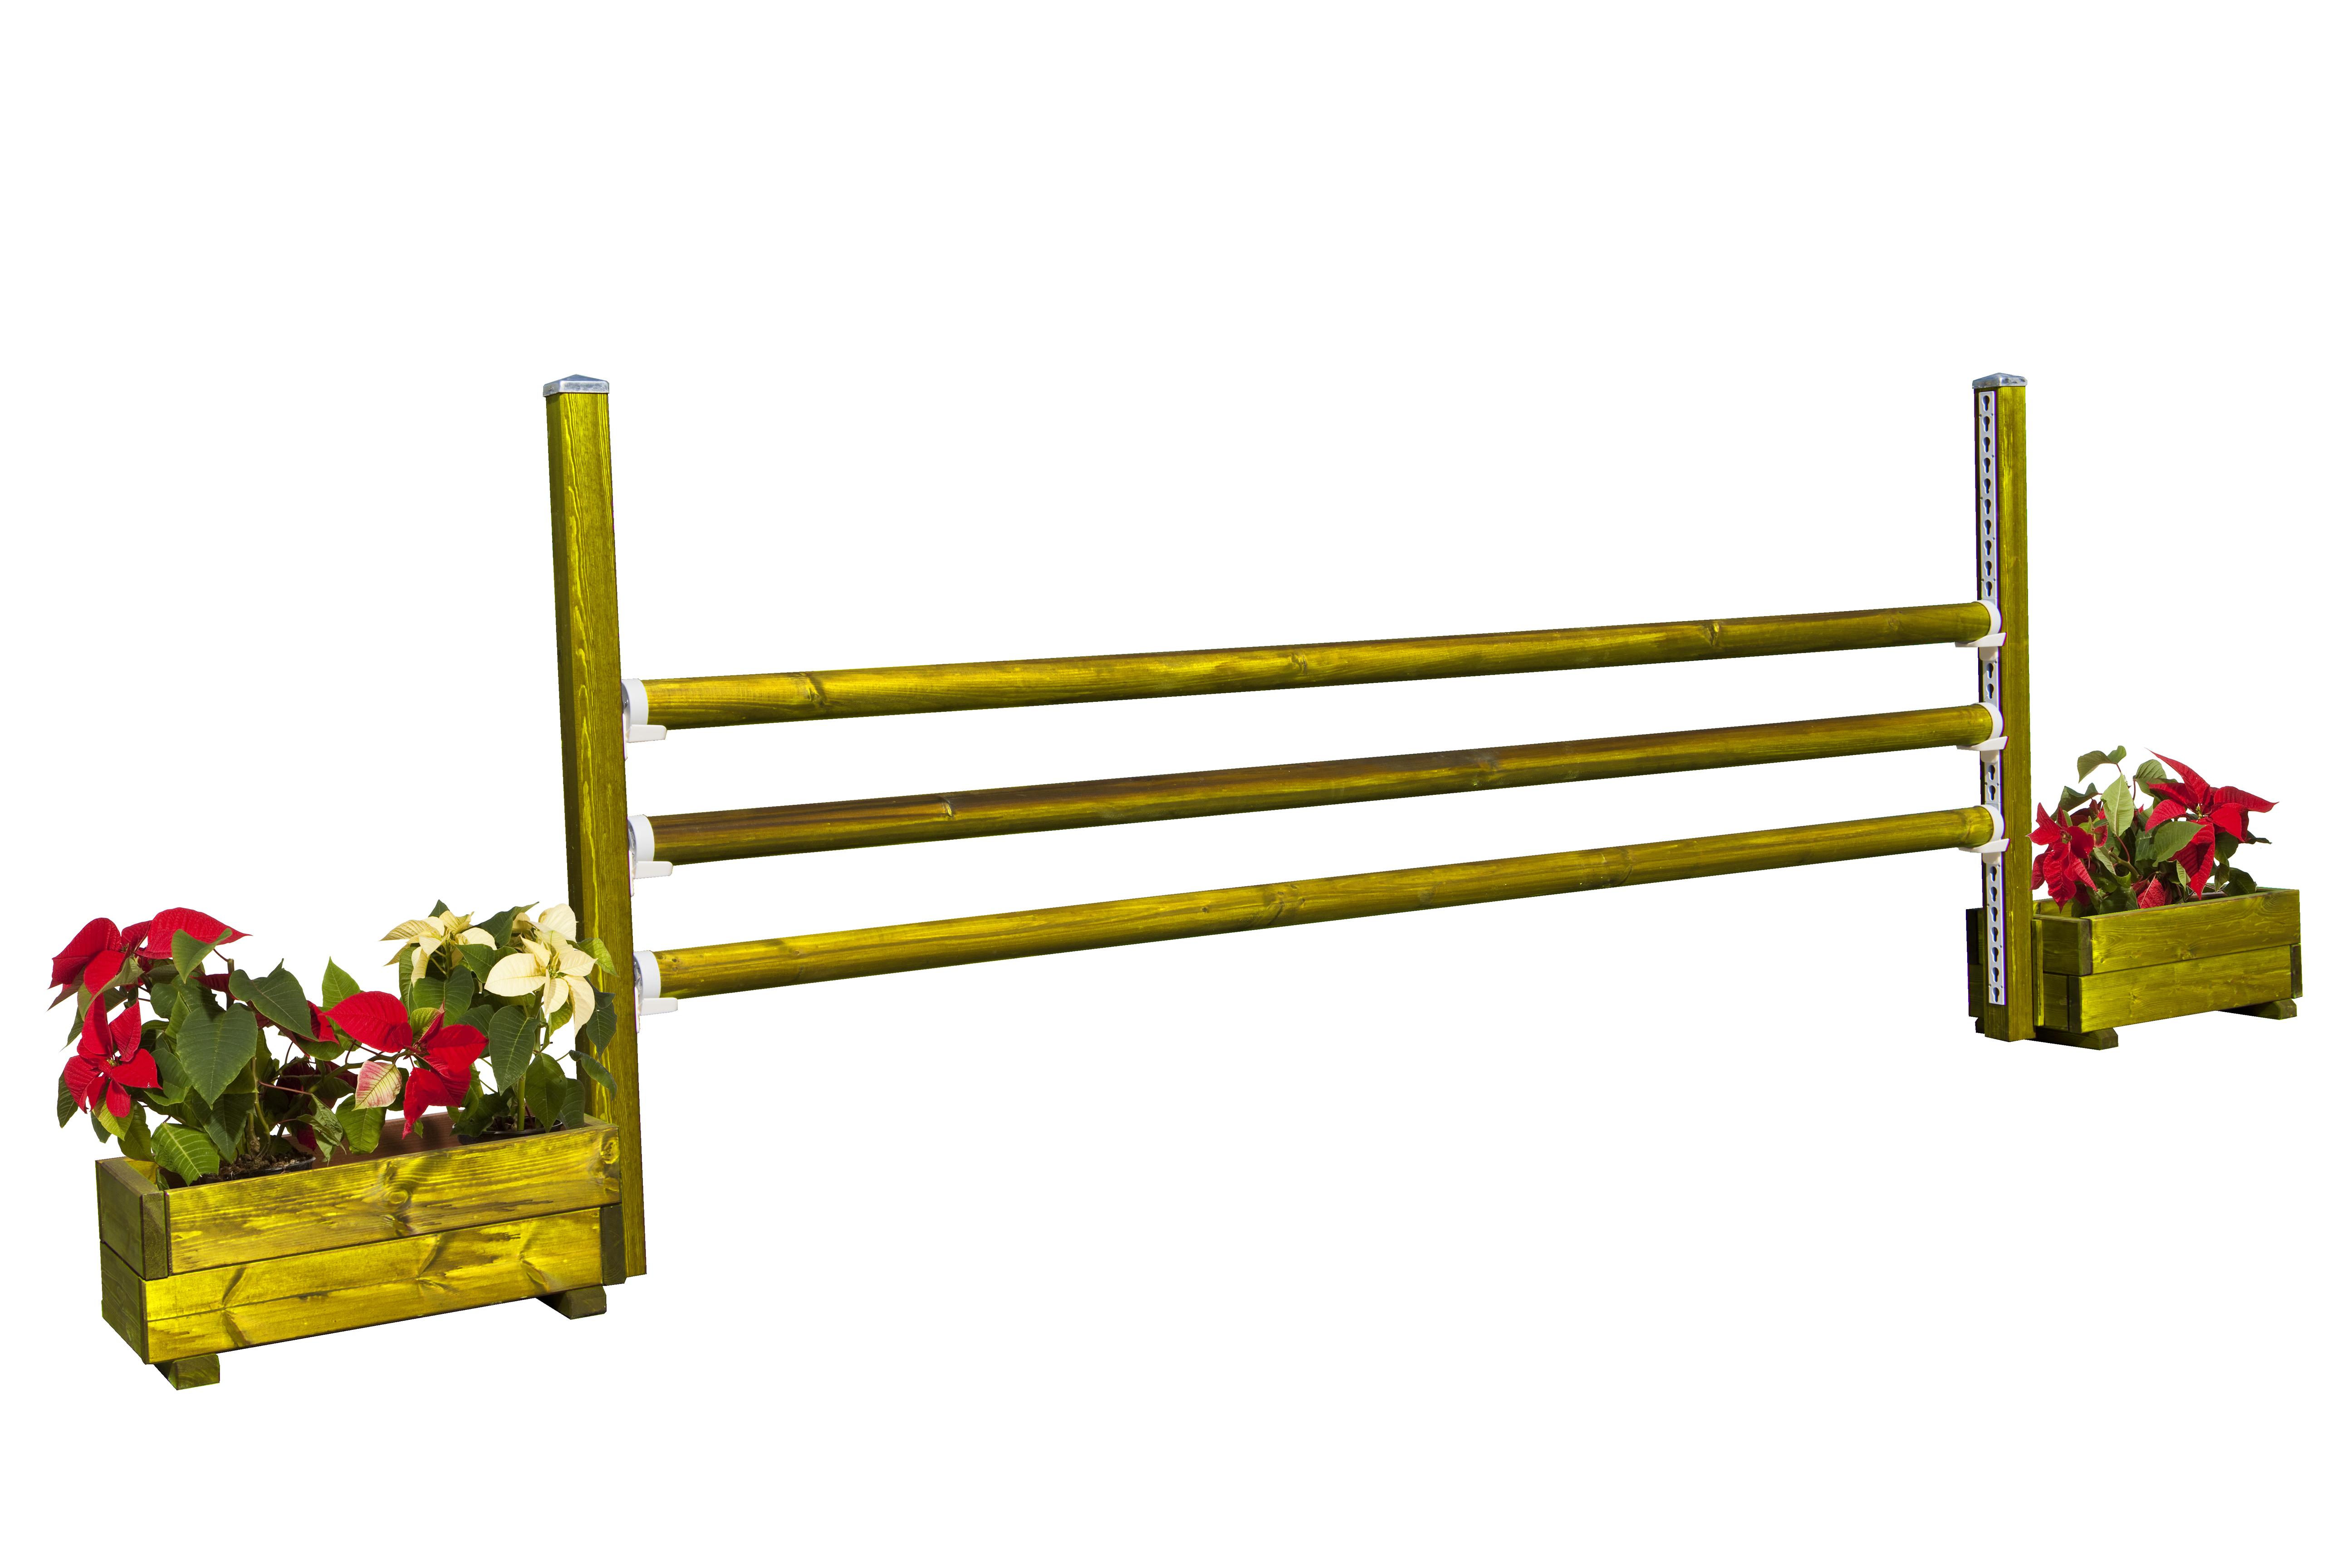 Obstaculo de salto de Hípica para Caballos Modelo Jardinera